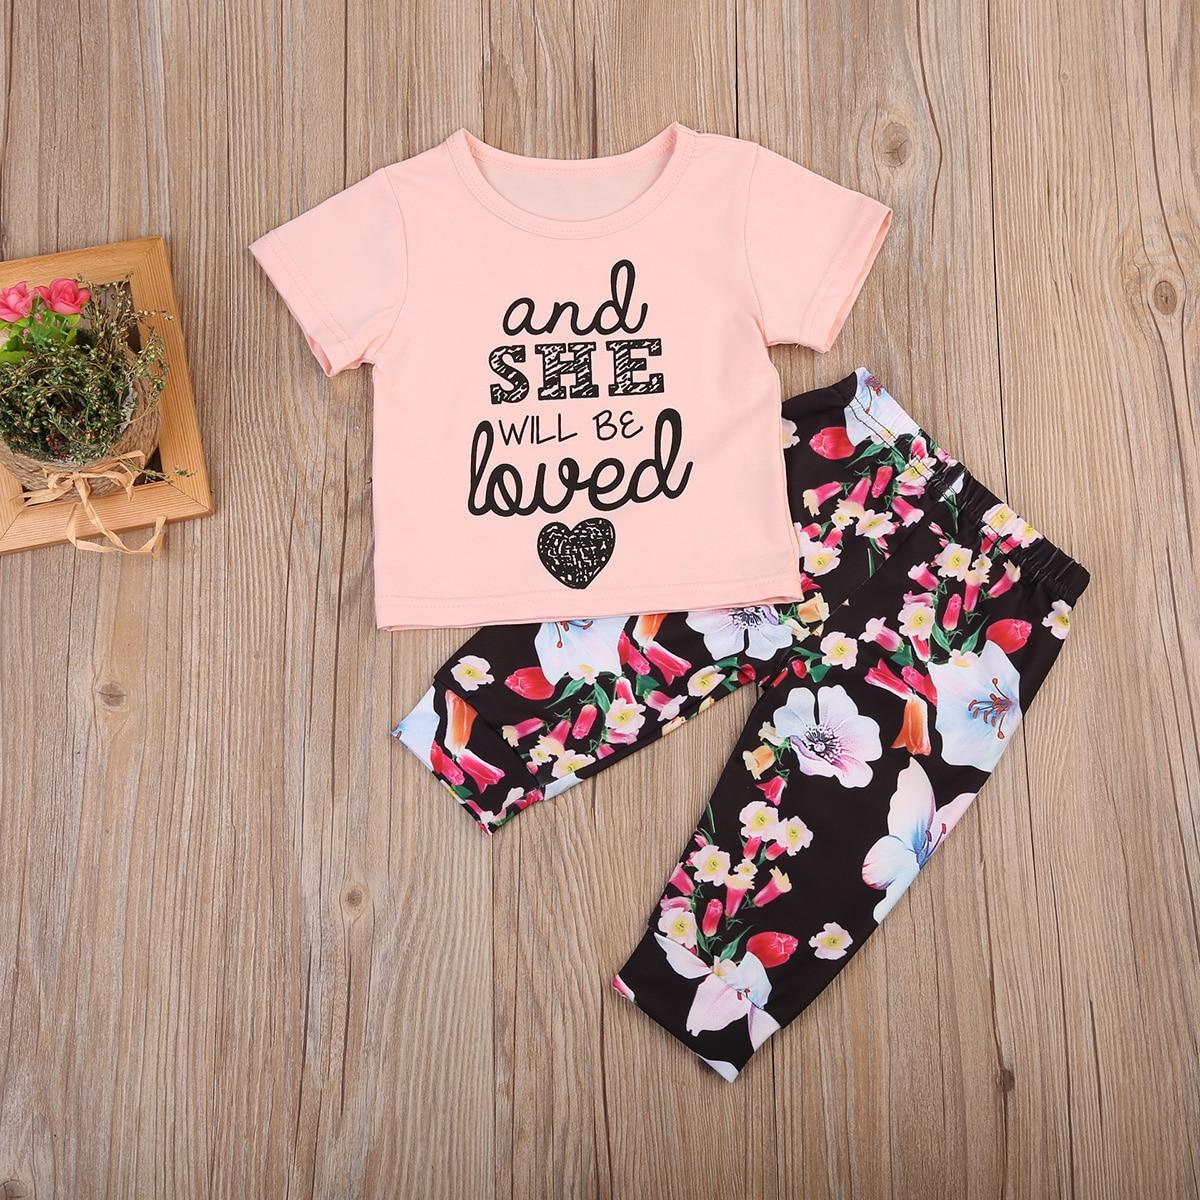 Cute 2Pcs Toddler Infant Baby Girls Floral Outfits T-shirt Tops +Floral Pants Kids Clothes Set 0-24M